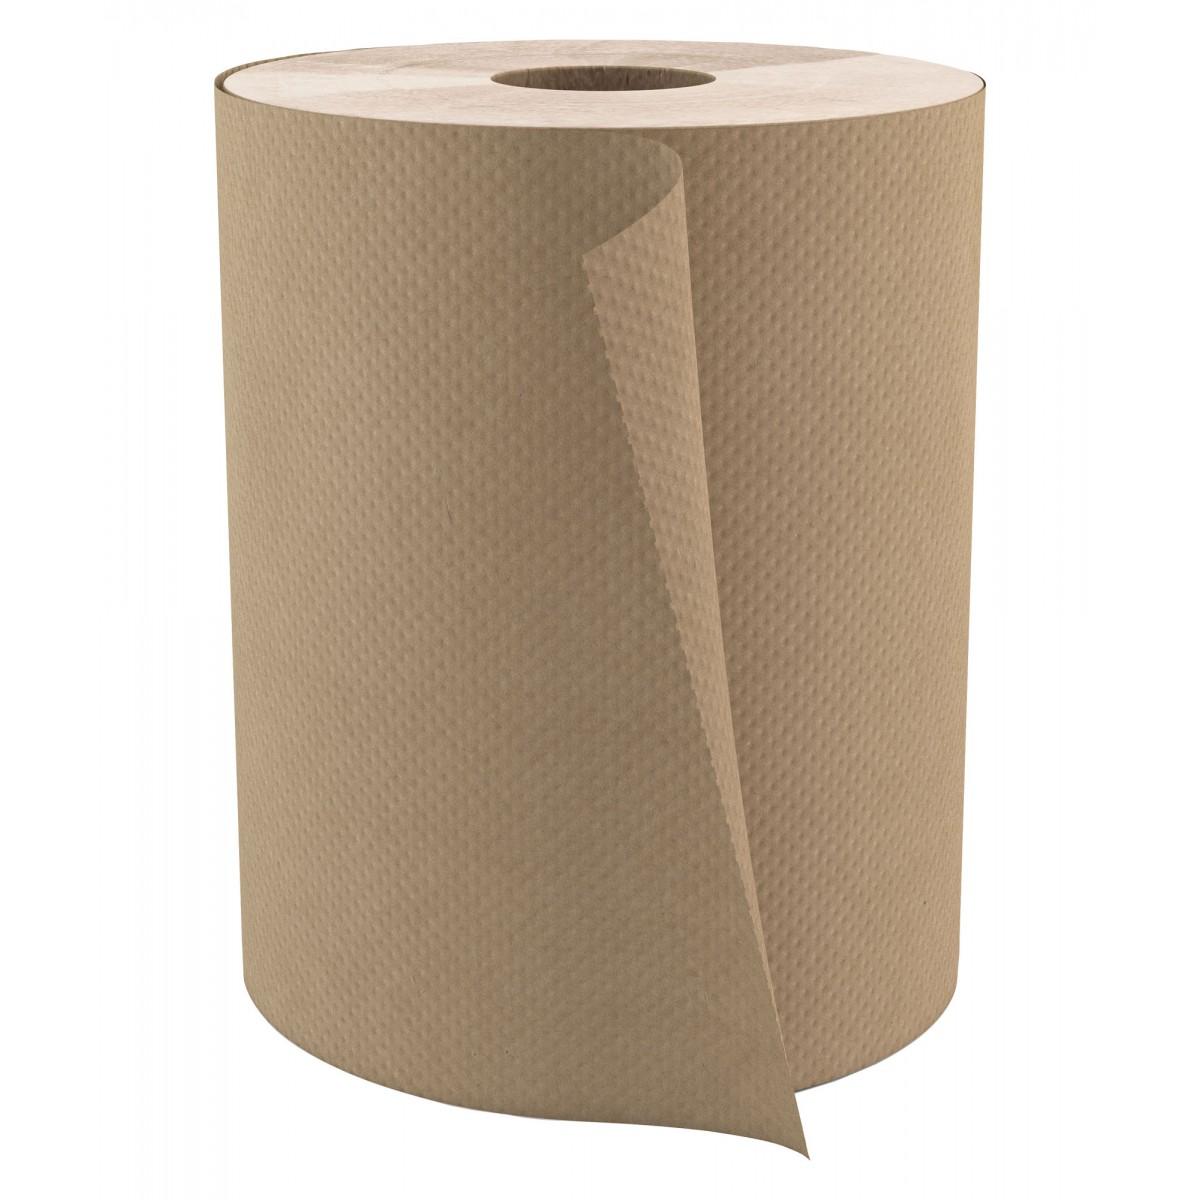 600 39 X 12 Paper Towels Rolls Brown Cascades Pro Select Box Of 12 Rolls